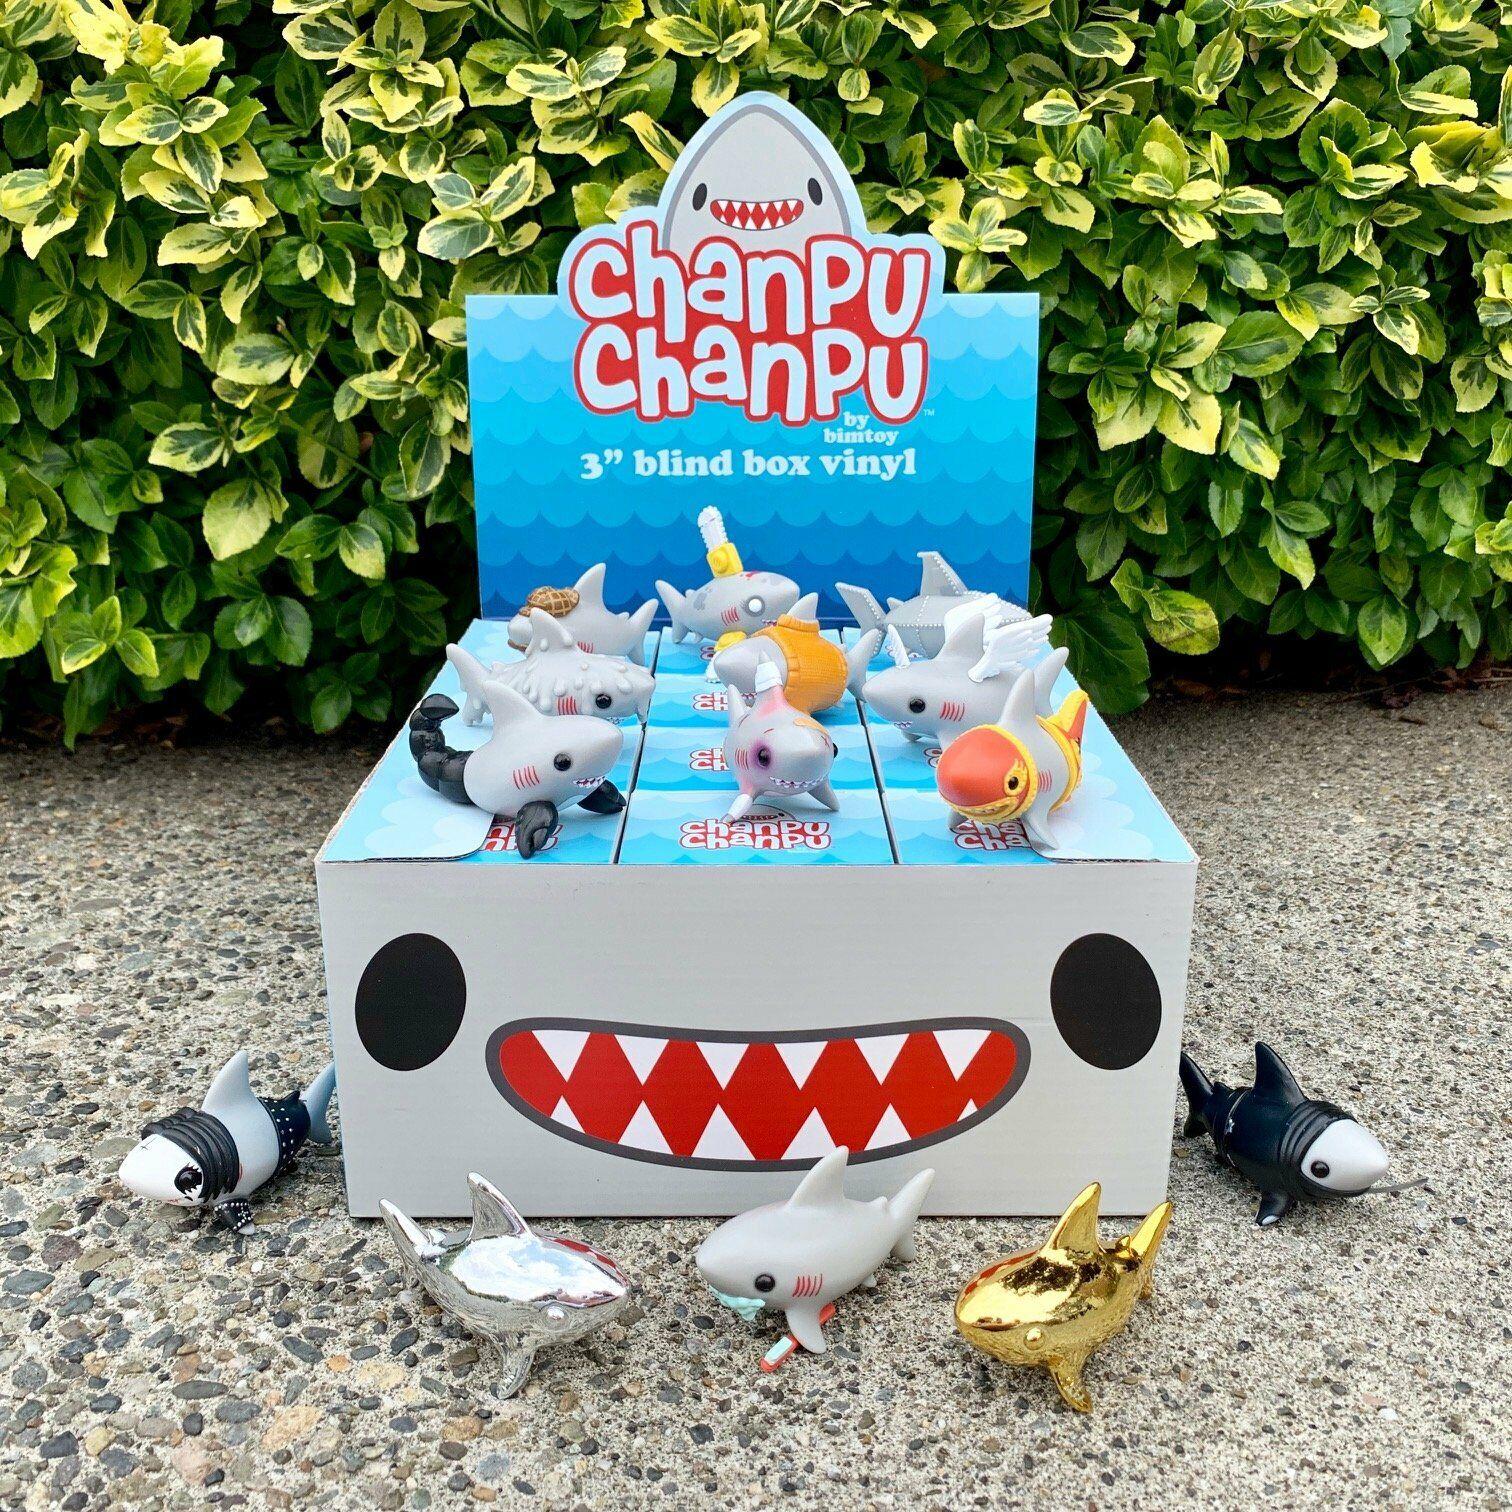 Bimgiocattolo Chanpu Chanpu Blind scatola Wave 1 Case Factory Sealed LE 599 Tiny Ghost